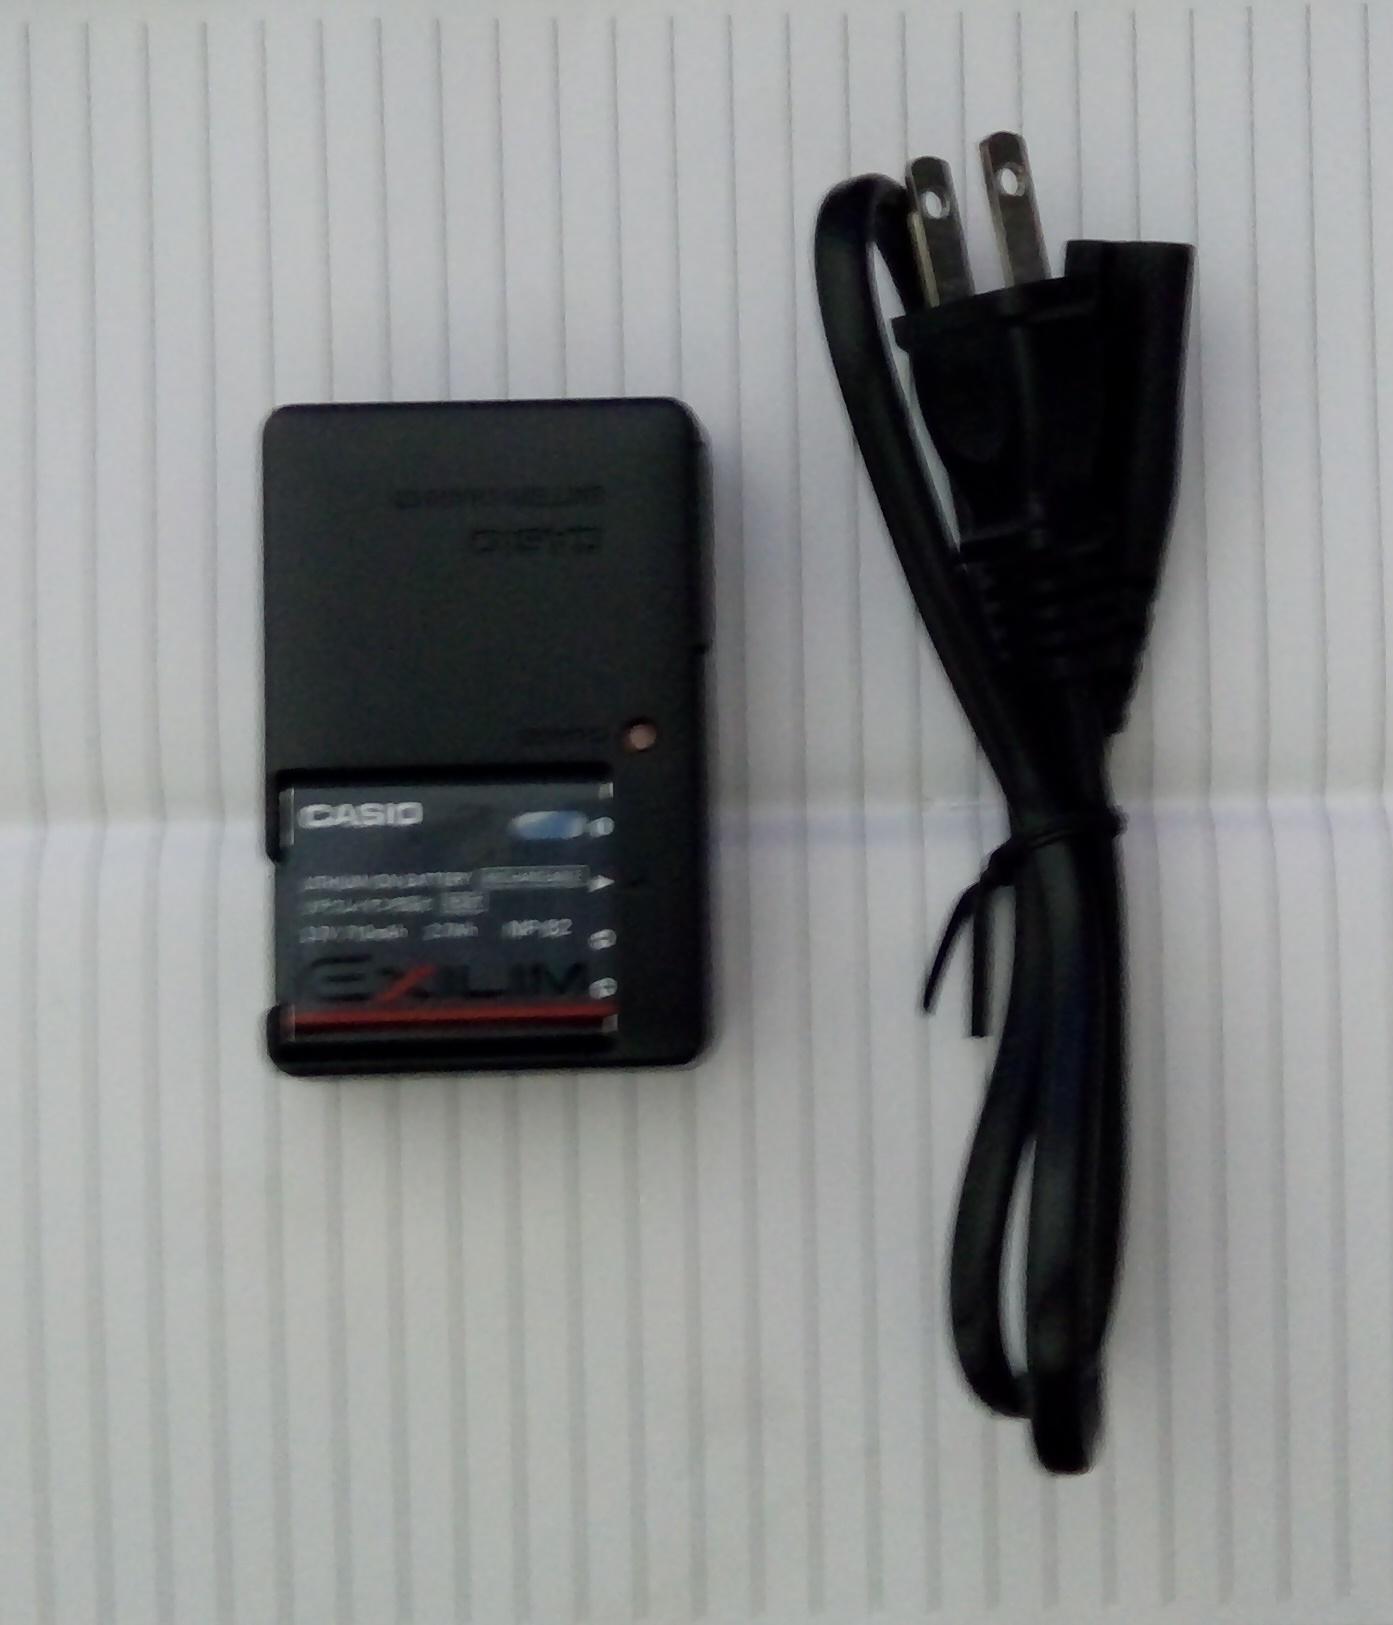 Baterai + Carger Casio NP-82 Batre Batere + Cesan Charger NP82 NP 82 Kompatibel Dengan CASIO NP-80